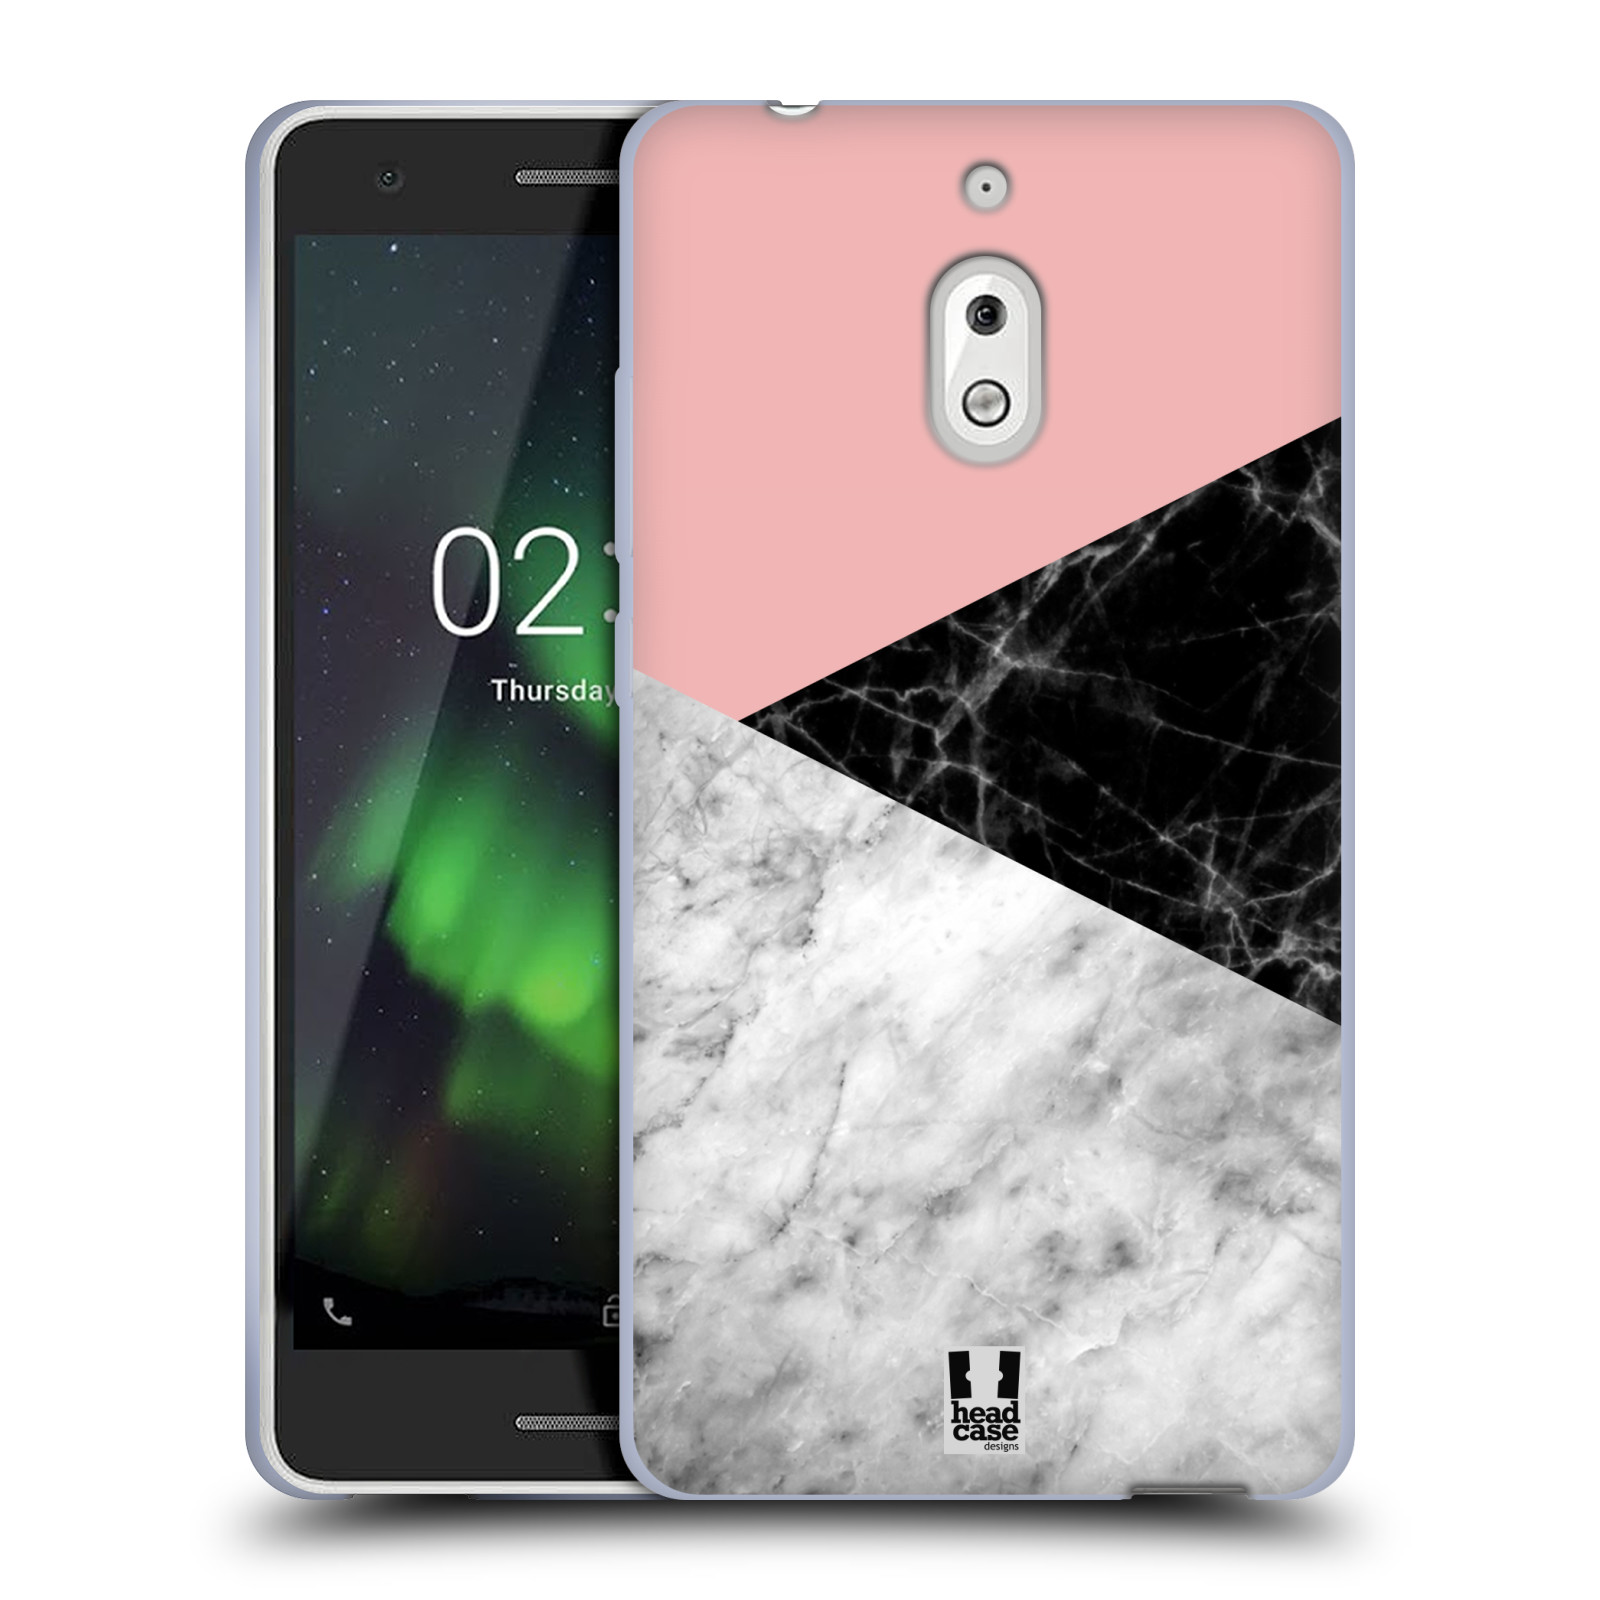 Silikonové pouzdro na mobil Nokia 2.1 - Head Case - Mramor mix